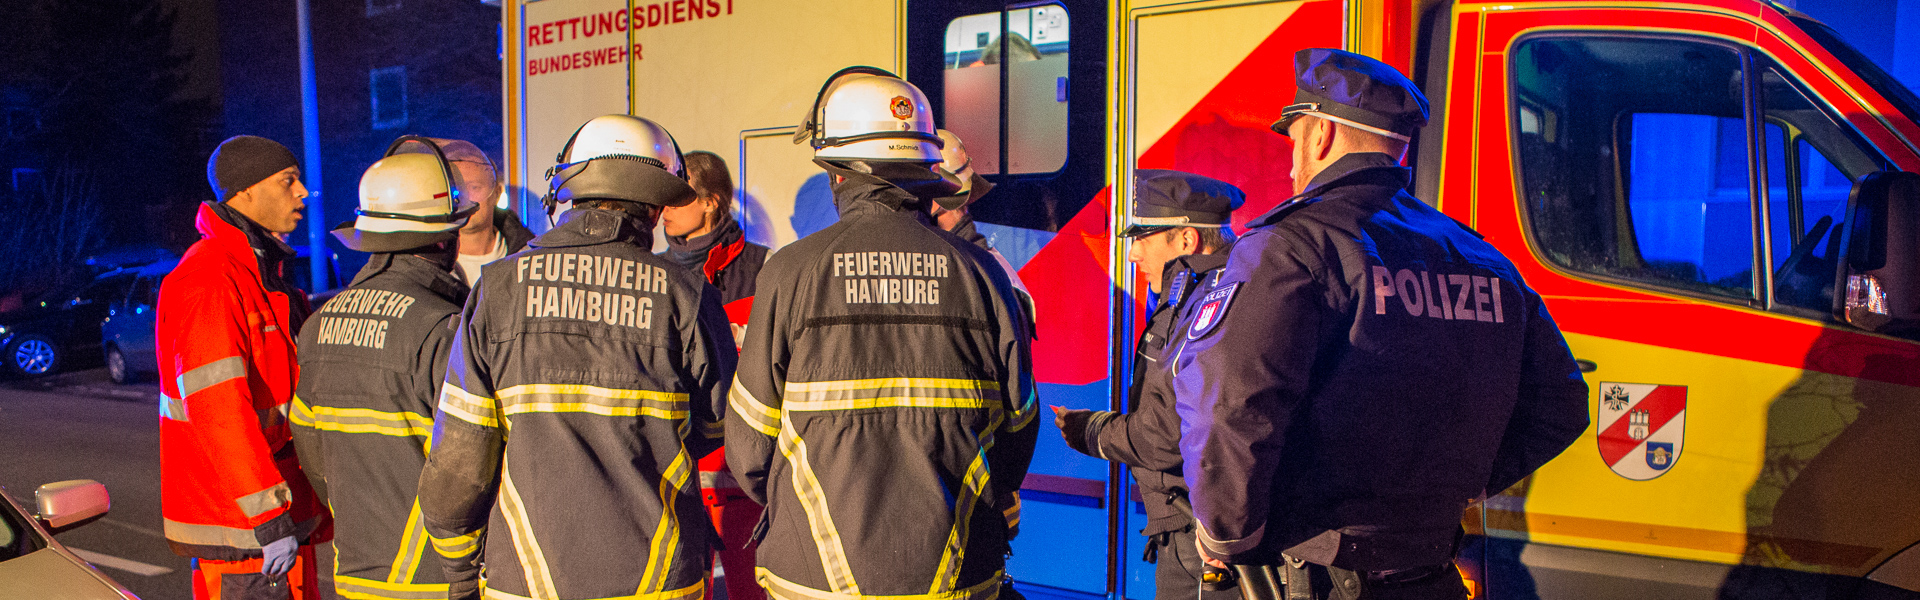 10.03.2018 – Tödlicher Motorradunfall in Wandsbek